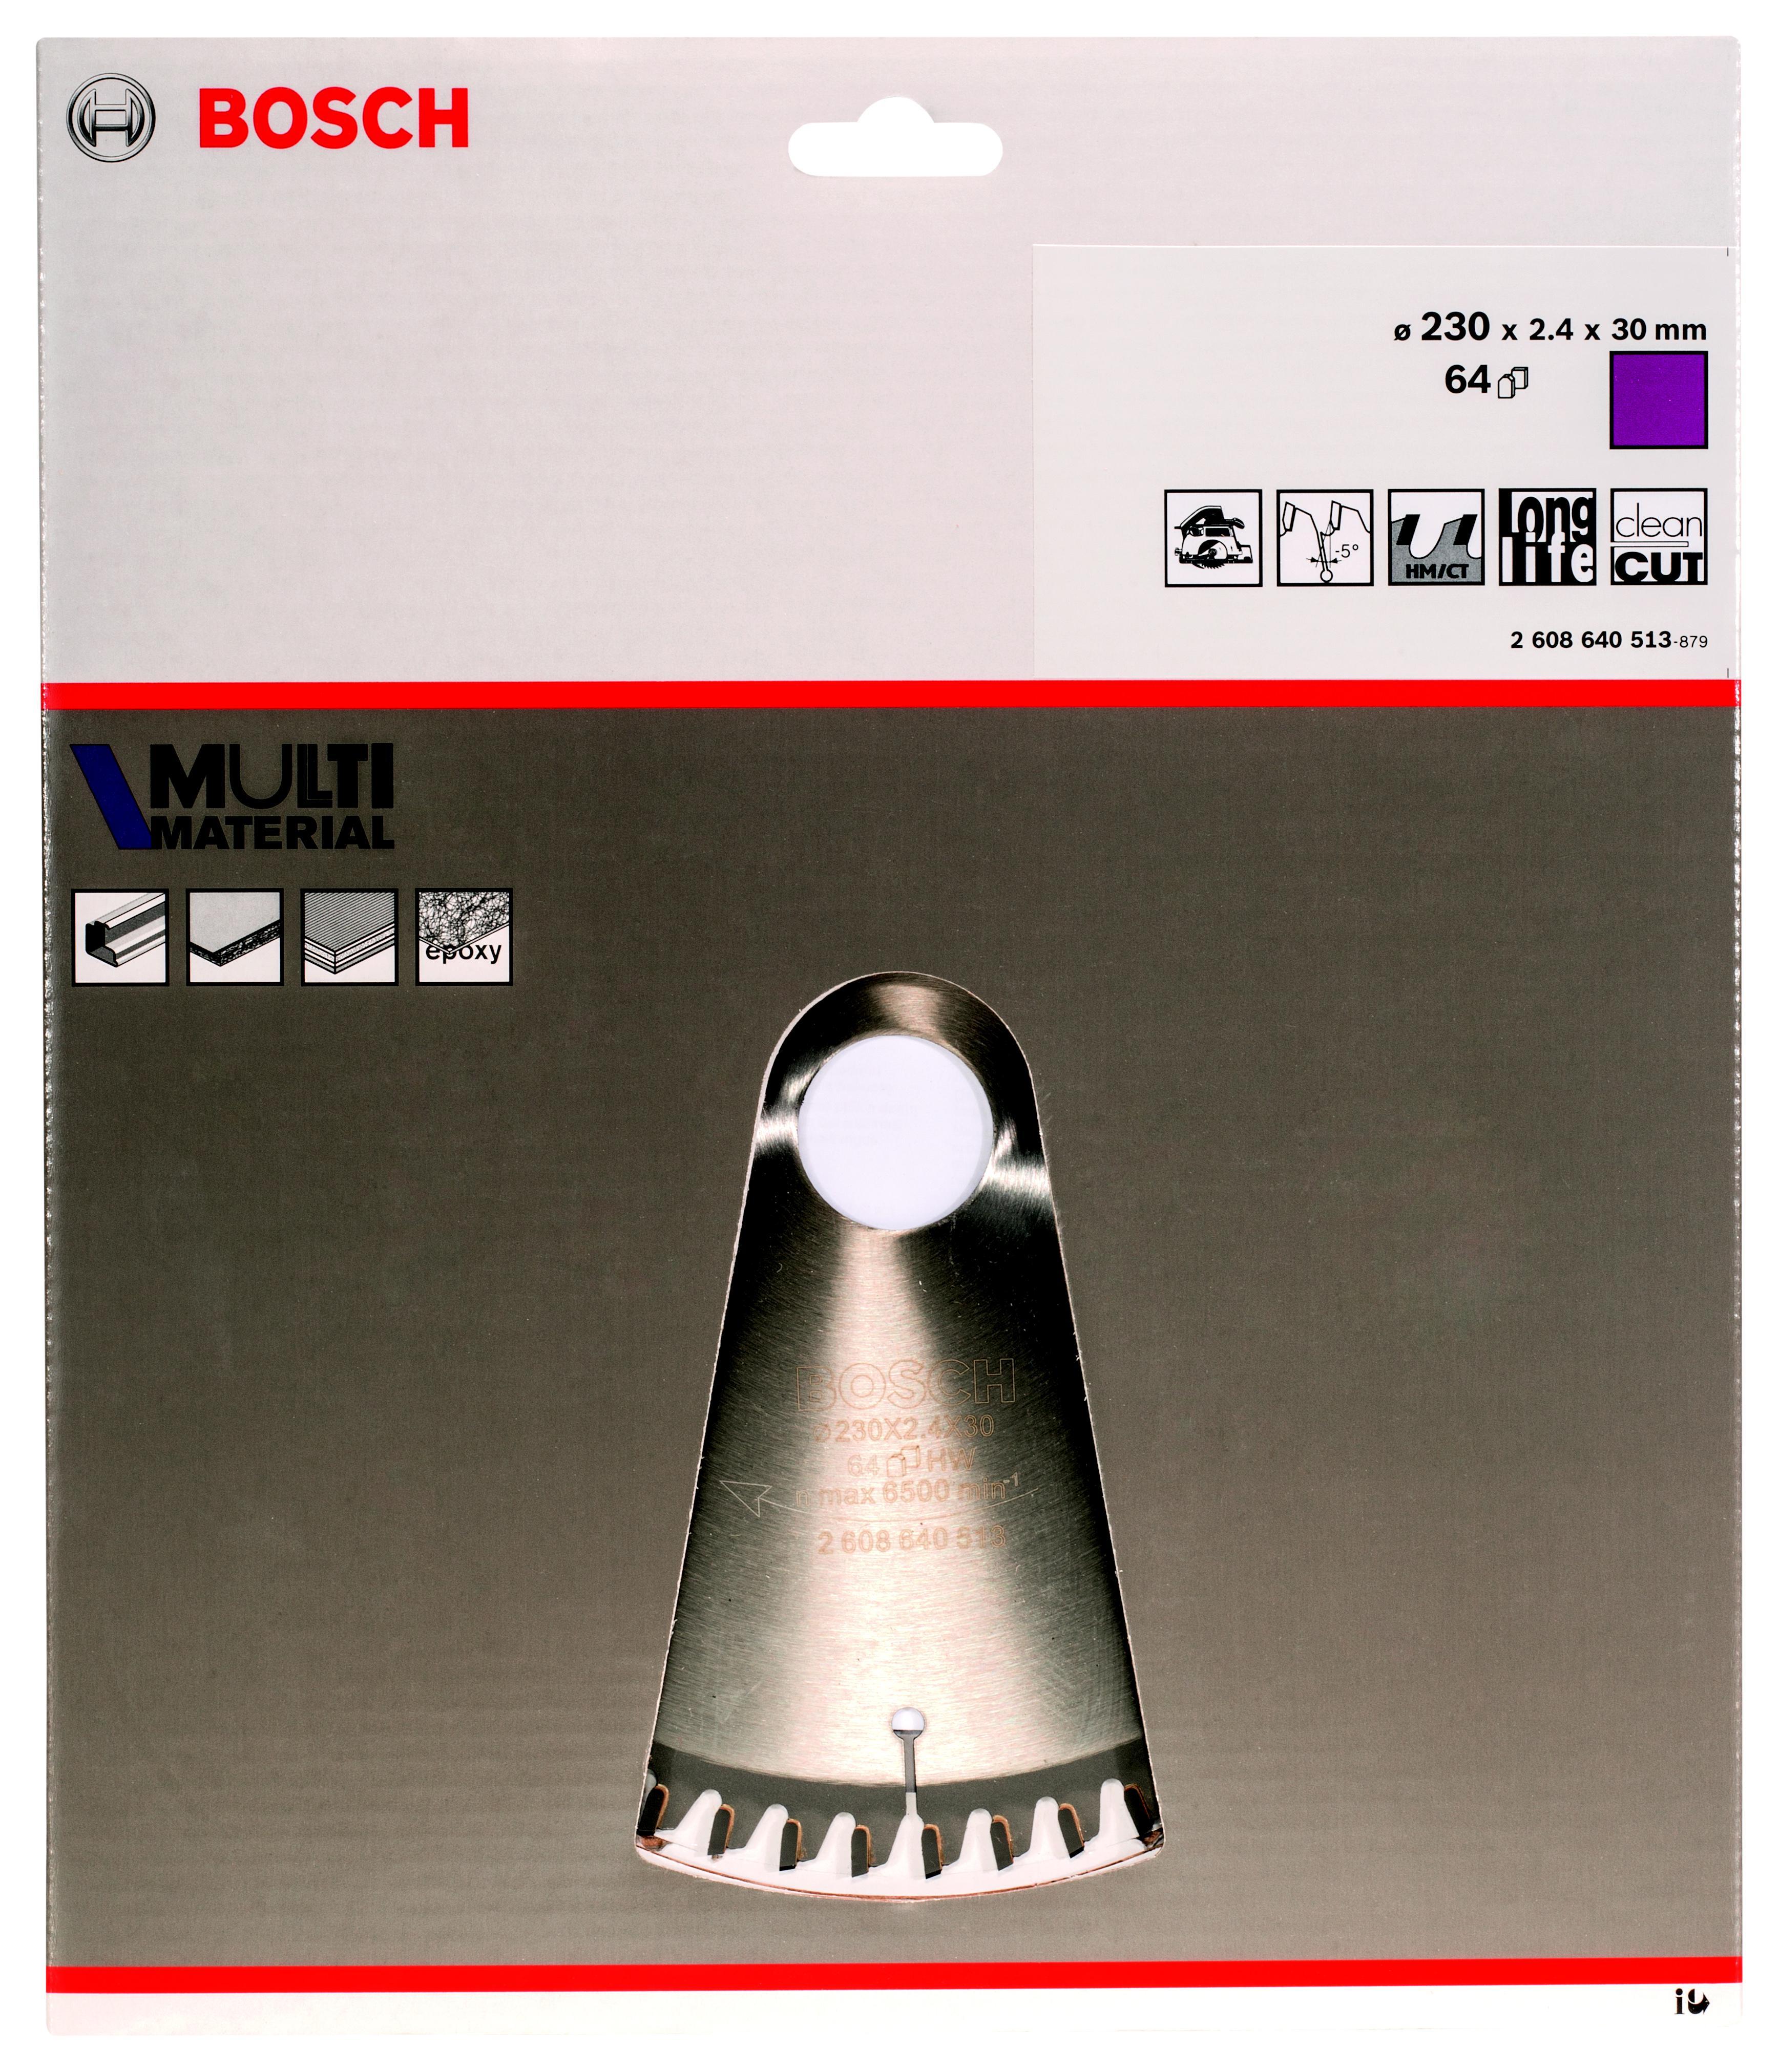 Диск пильный твердосплавный Bosch 2608640513 диск пильный твердосплавный hammer 335х32 30мм 64 зуб